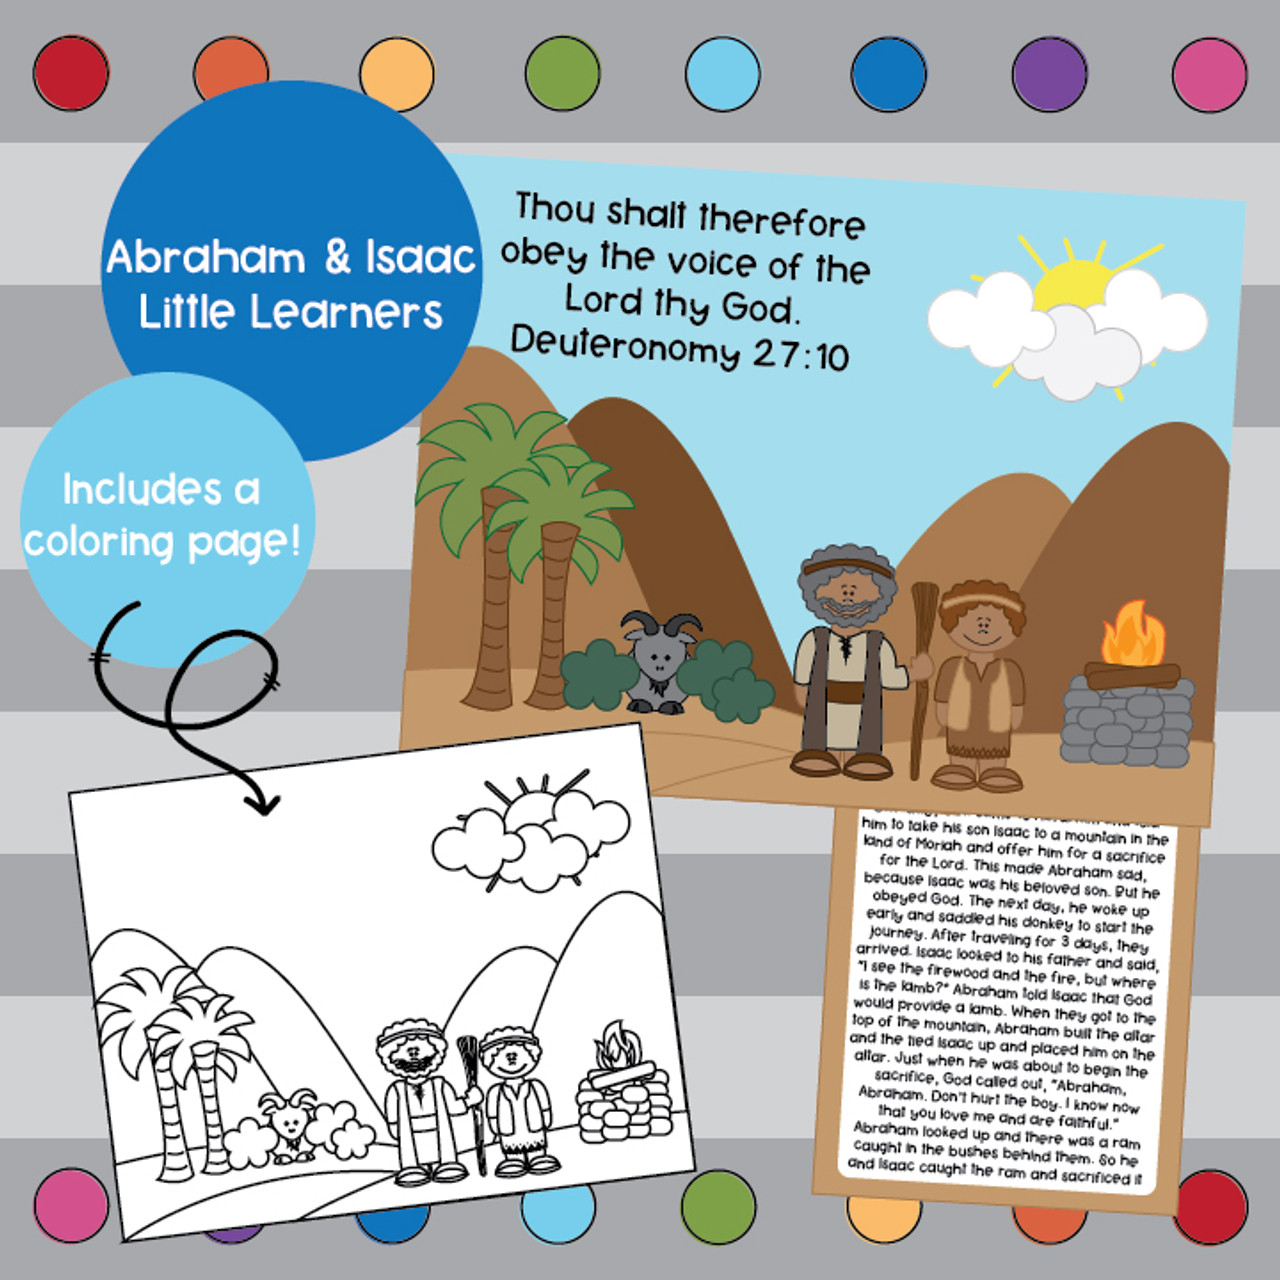 Abraham and Isaac coloring page, story card and memory verse.